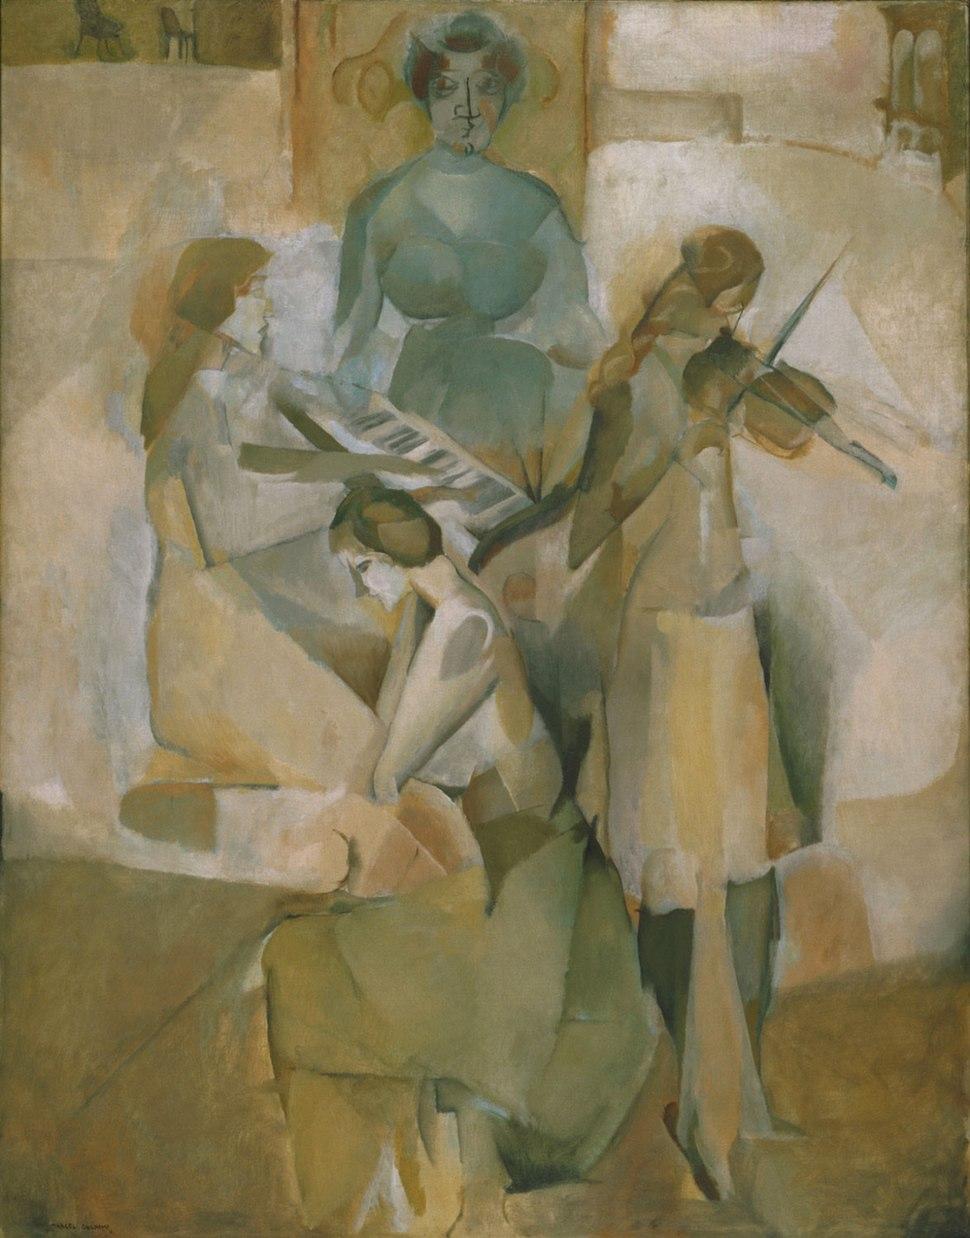 Marcel Duchamp, 1911, La sonate (Sonata), oil on canvas, 145.1 x 113.3 cm, Philadelphia Museum of Art